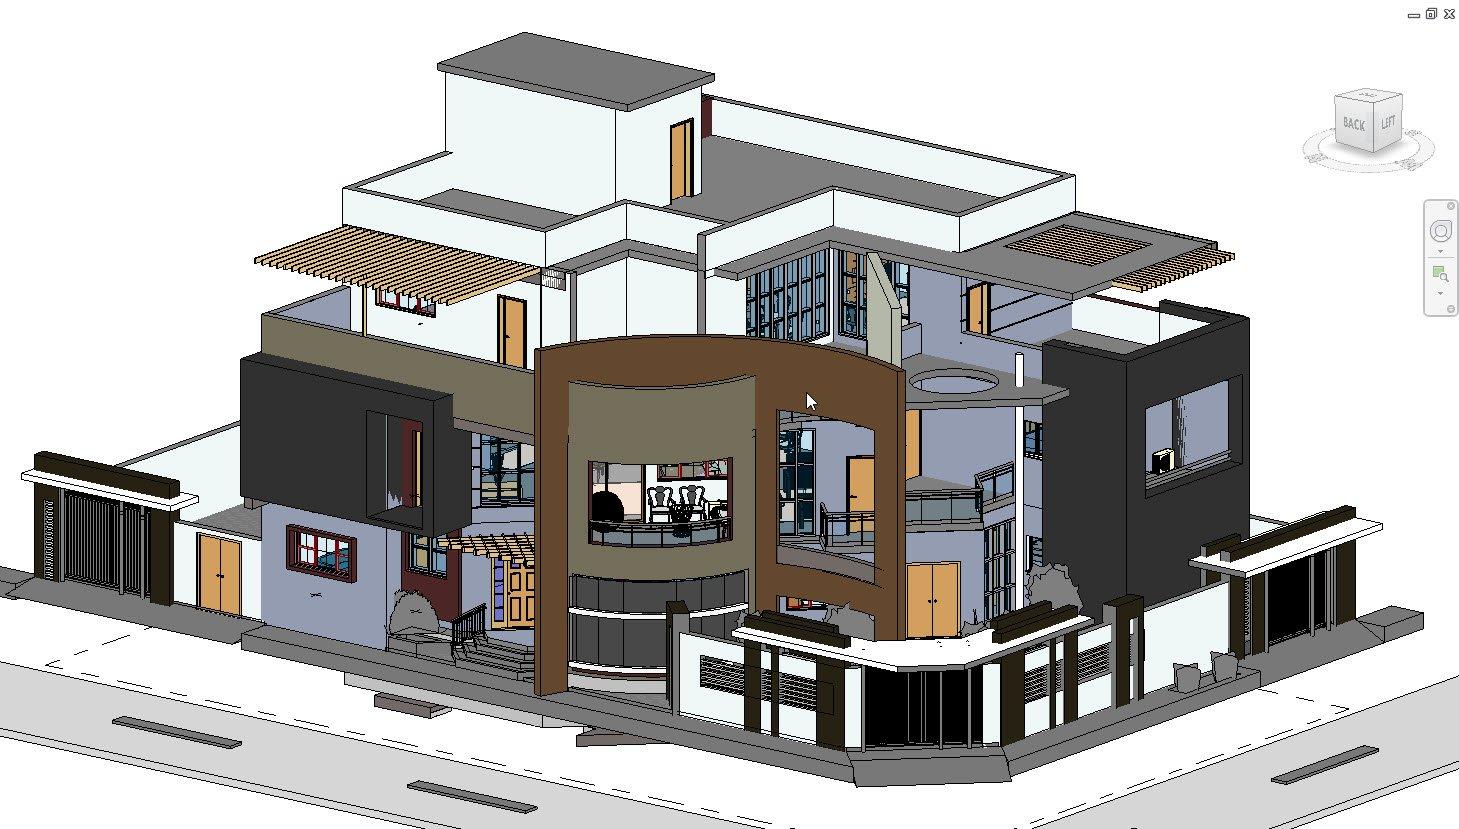 Modern Villa in revit 2017 3D Model in Buildings 3DExport